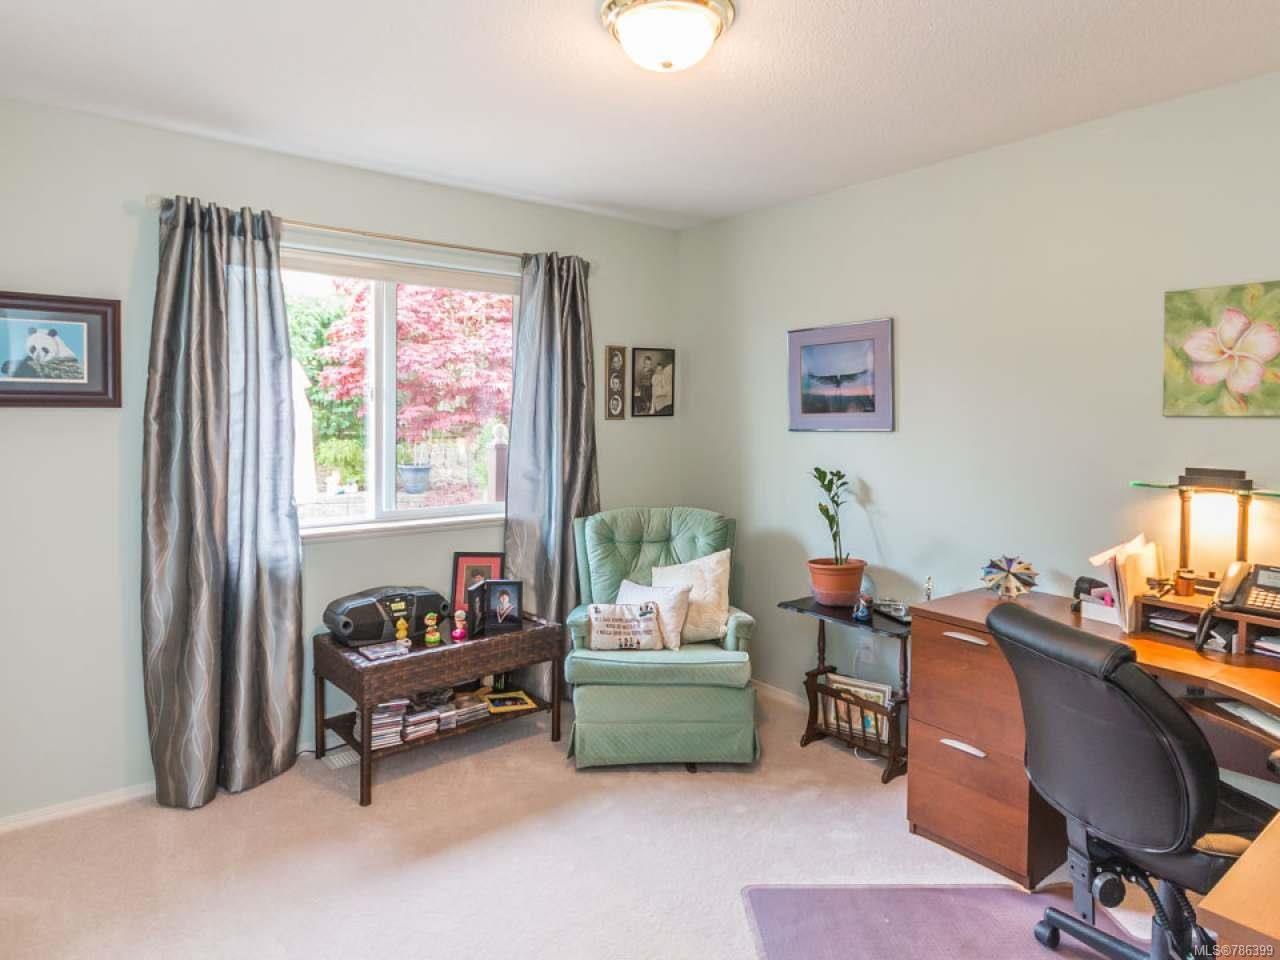 Photo 27: Photos: 5371 HIGHRIDGE PLACE in NANAIMO: Na North Nanaimo House for sale (Nanaimo)  : MLS®# 786399